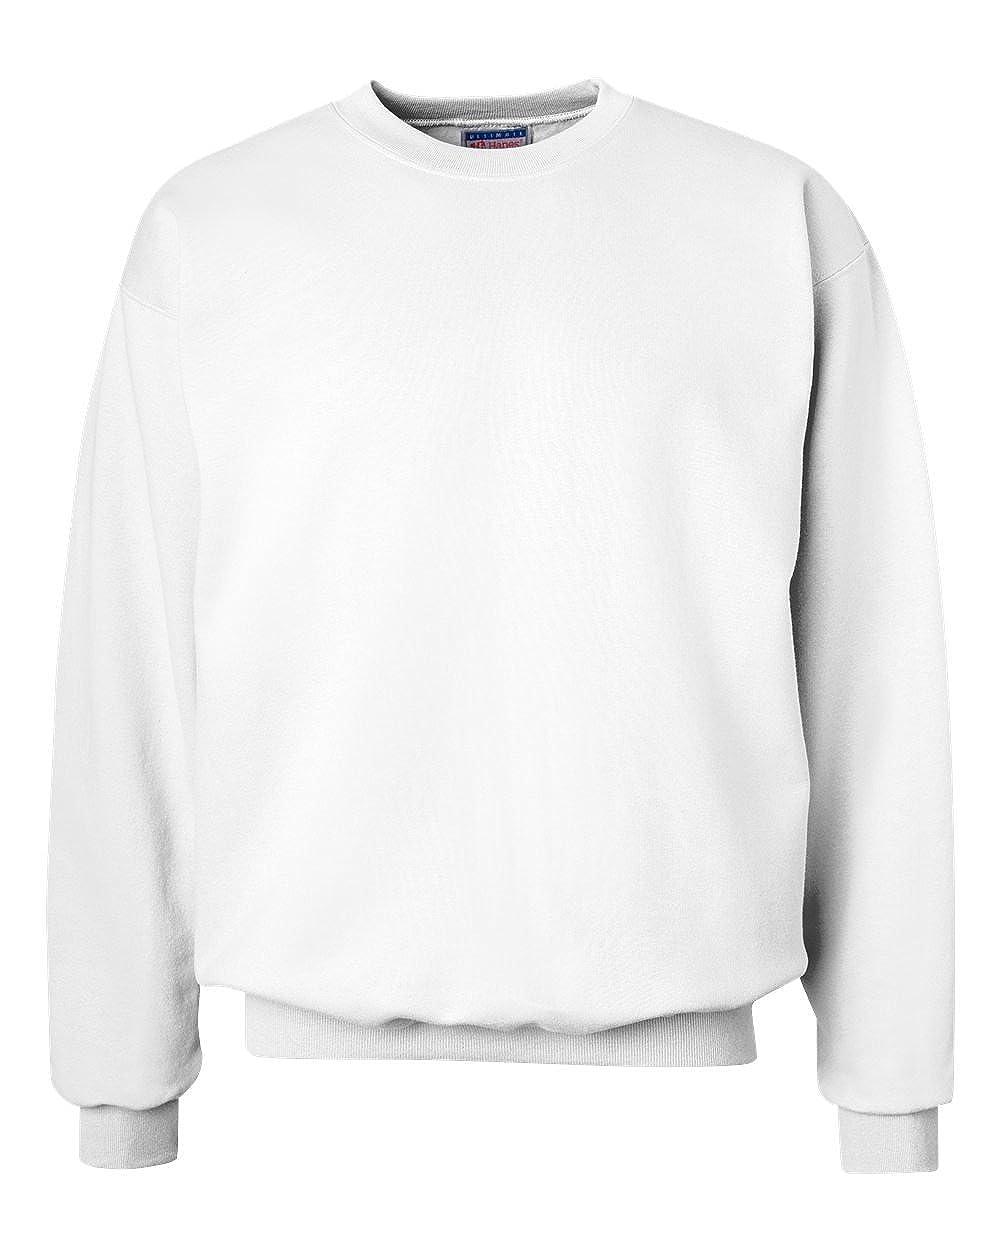 Hanes 90//10 Cotton//Polyester 10.2oz Ultimate Cotton Crewneck S-White